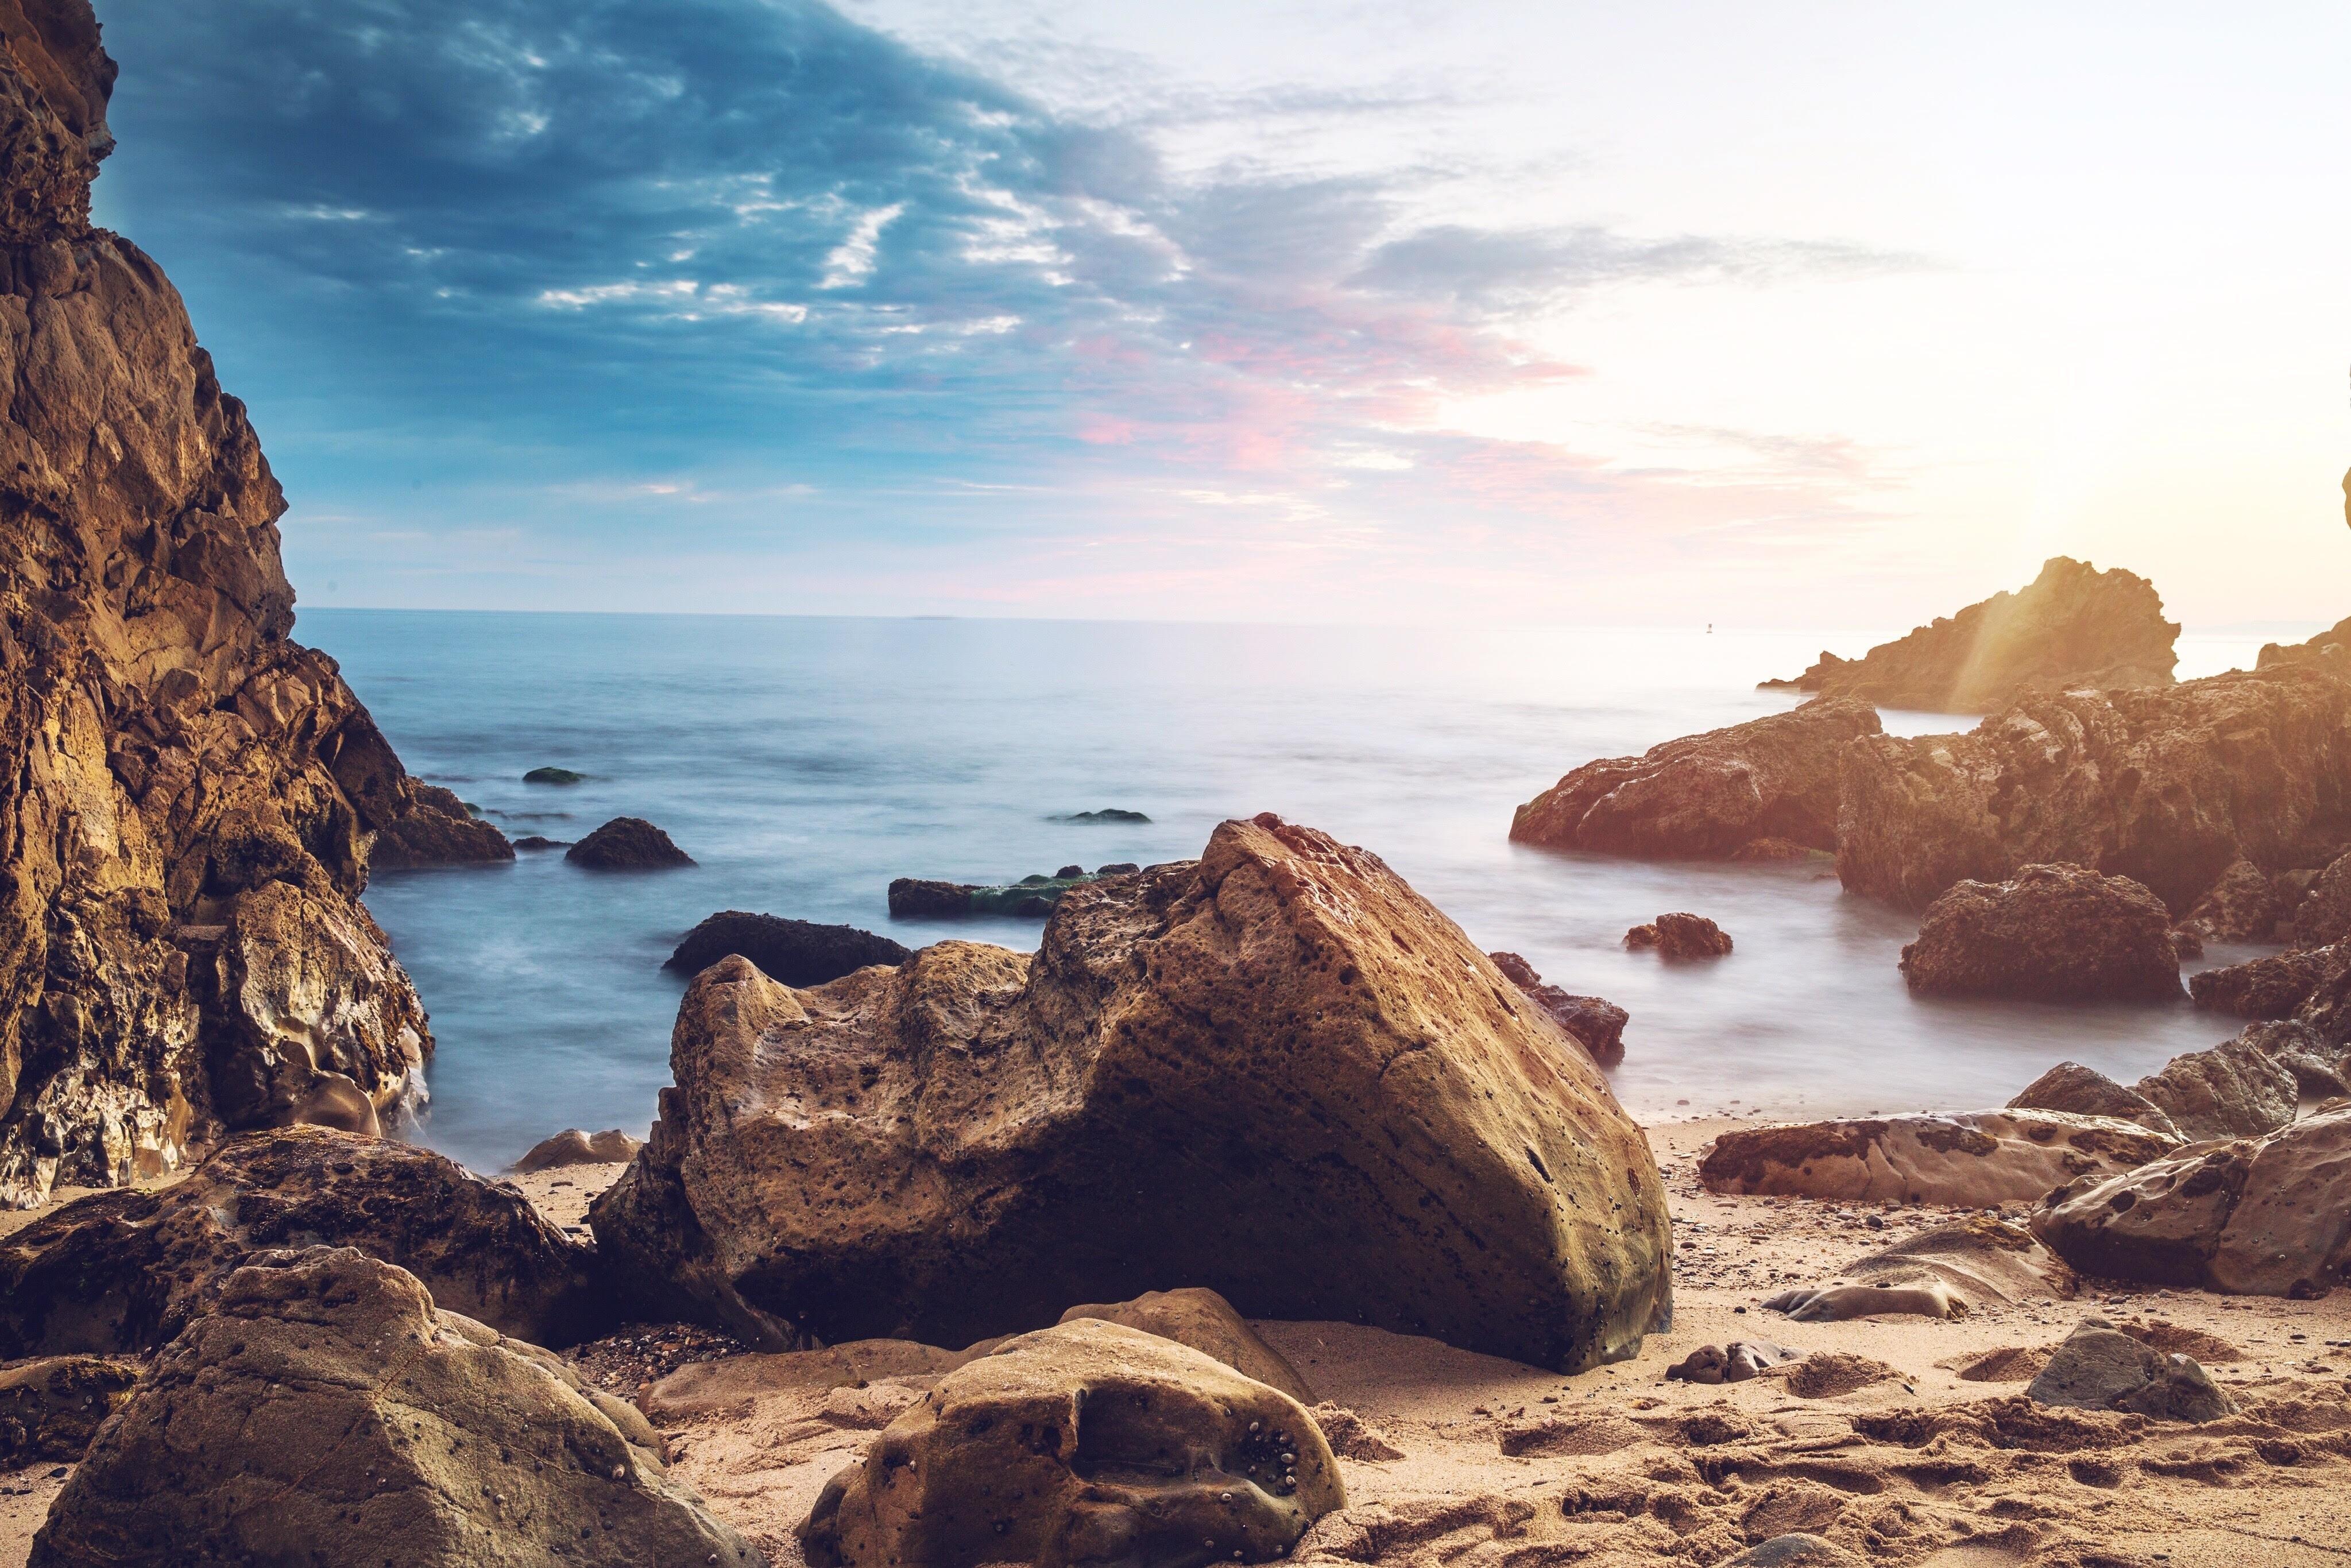 New 4k Rocky Beach Wallpaper | The Most Beautiful Beach Wallpapers ...